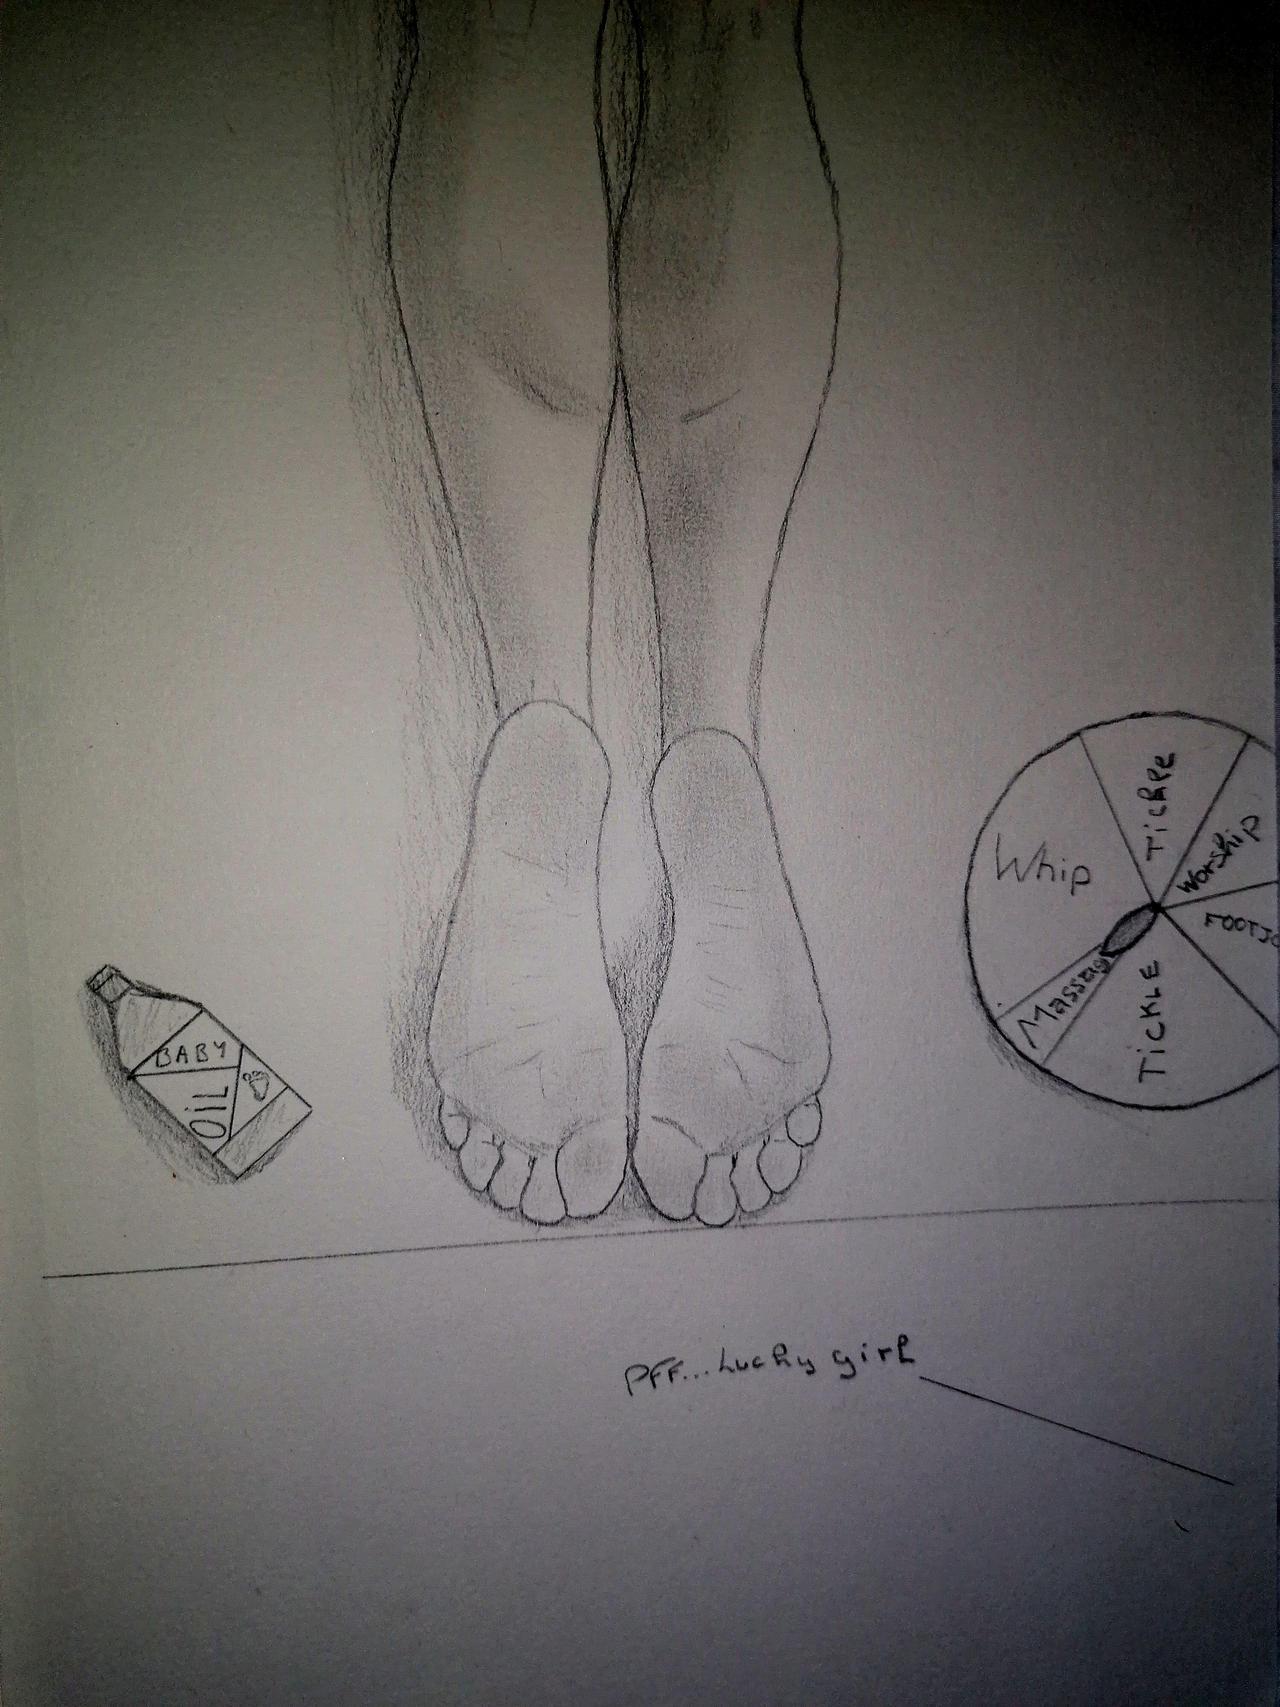 wheel_of_luck_foot_fetish_version_by_pirosodo_de4lqgm-fullview.jpg?token=eyJ0eXAiOiJKV1QiLCJhbGciOiJIUzI1NiJ9.eyJzdWIiOiJ1cm46YXBwOiIsImlzcyI6InVybjphcHA6Iiwib2JqIjpbW3siaGVpZ2h0IjoiPD0xNzA3IiwicGF0aCI6IlwvZlwvZWE0YTlhMTctMDdmMC00NTJkLThlOTctM2M5MzUxOTVjYjg1XC9kZTRscWdtLWRjZmU0OWZmLThmOTUtNDFjNi1hNDdjLTcwZGM1OTI4NjY4Yy5qcGciLCJ3aWR0aCI6Ijw9MTI4MCJ9XV0sImF1ZCI6WyJ1cm46c2VydmljZTppbWFnZS5vcGVyYXRpb25zIl19.H_AMro9aUHd9JRsFl0_NQvlQQypegIK2qai3ahJd2j0